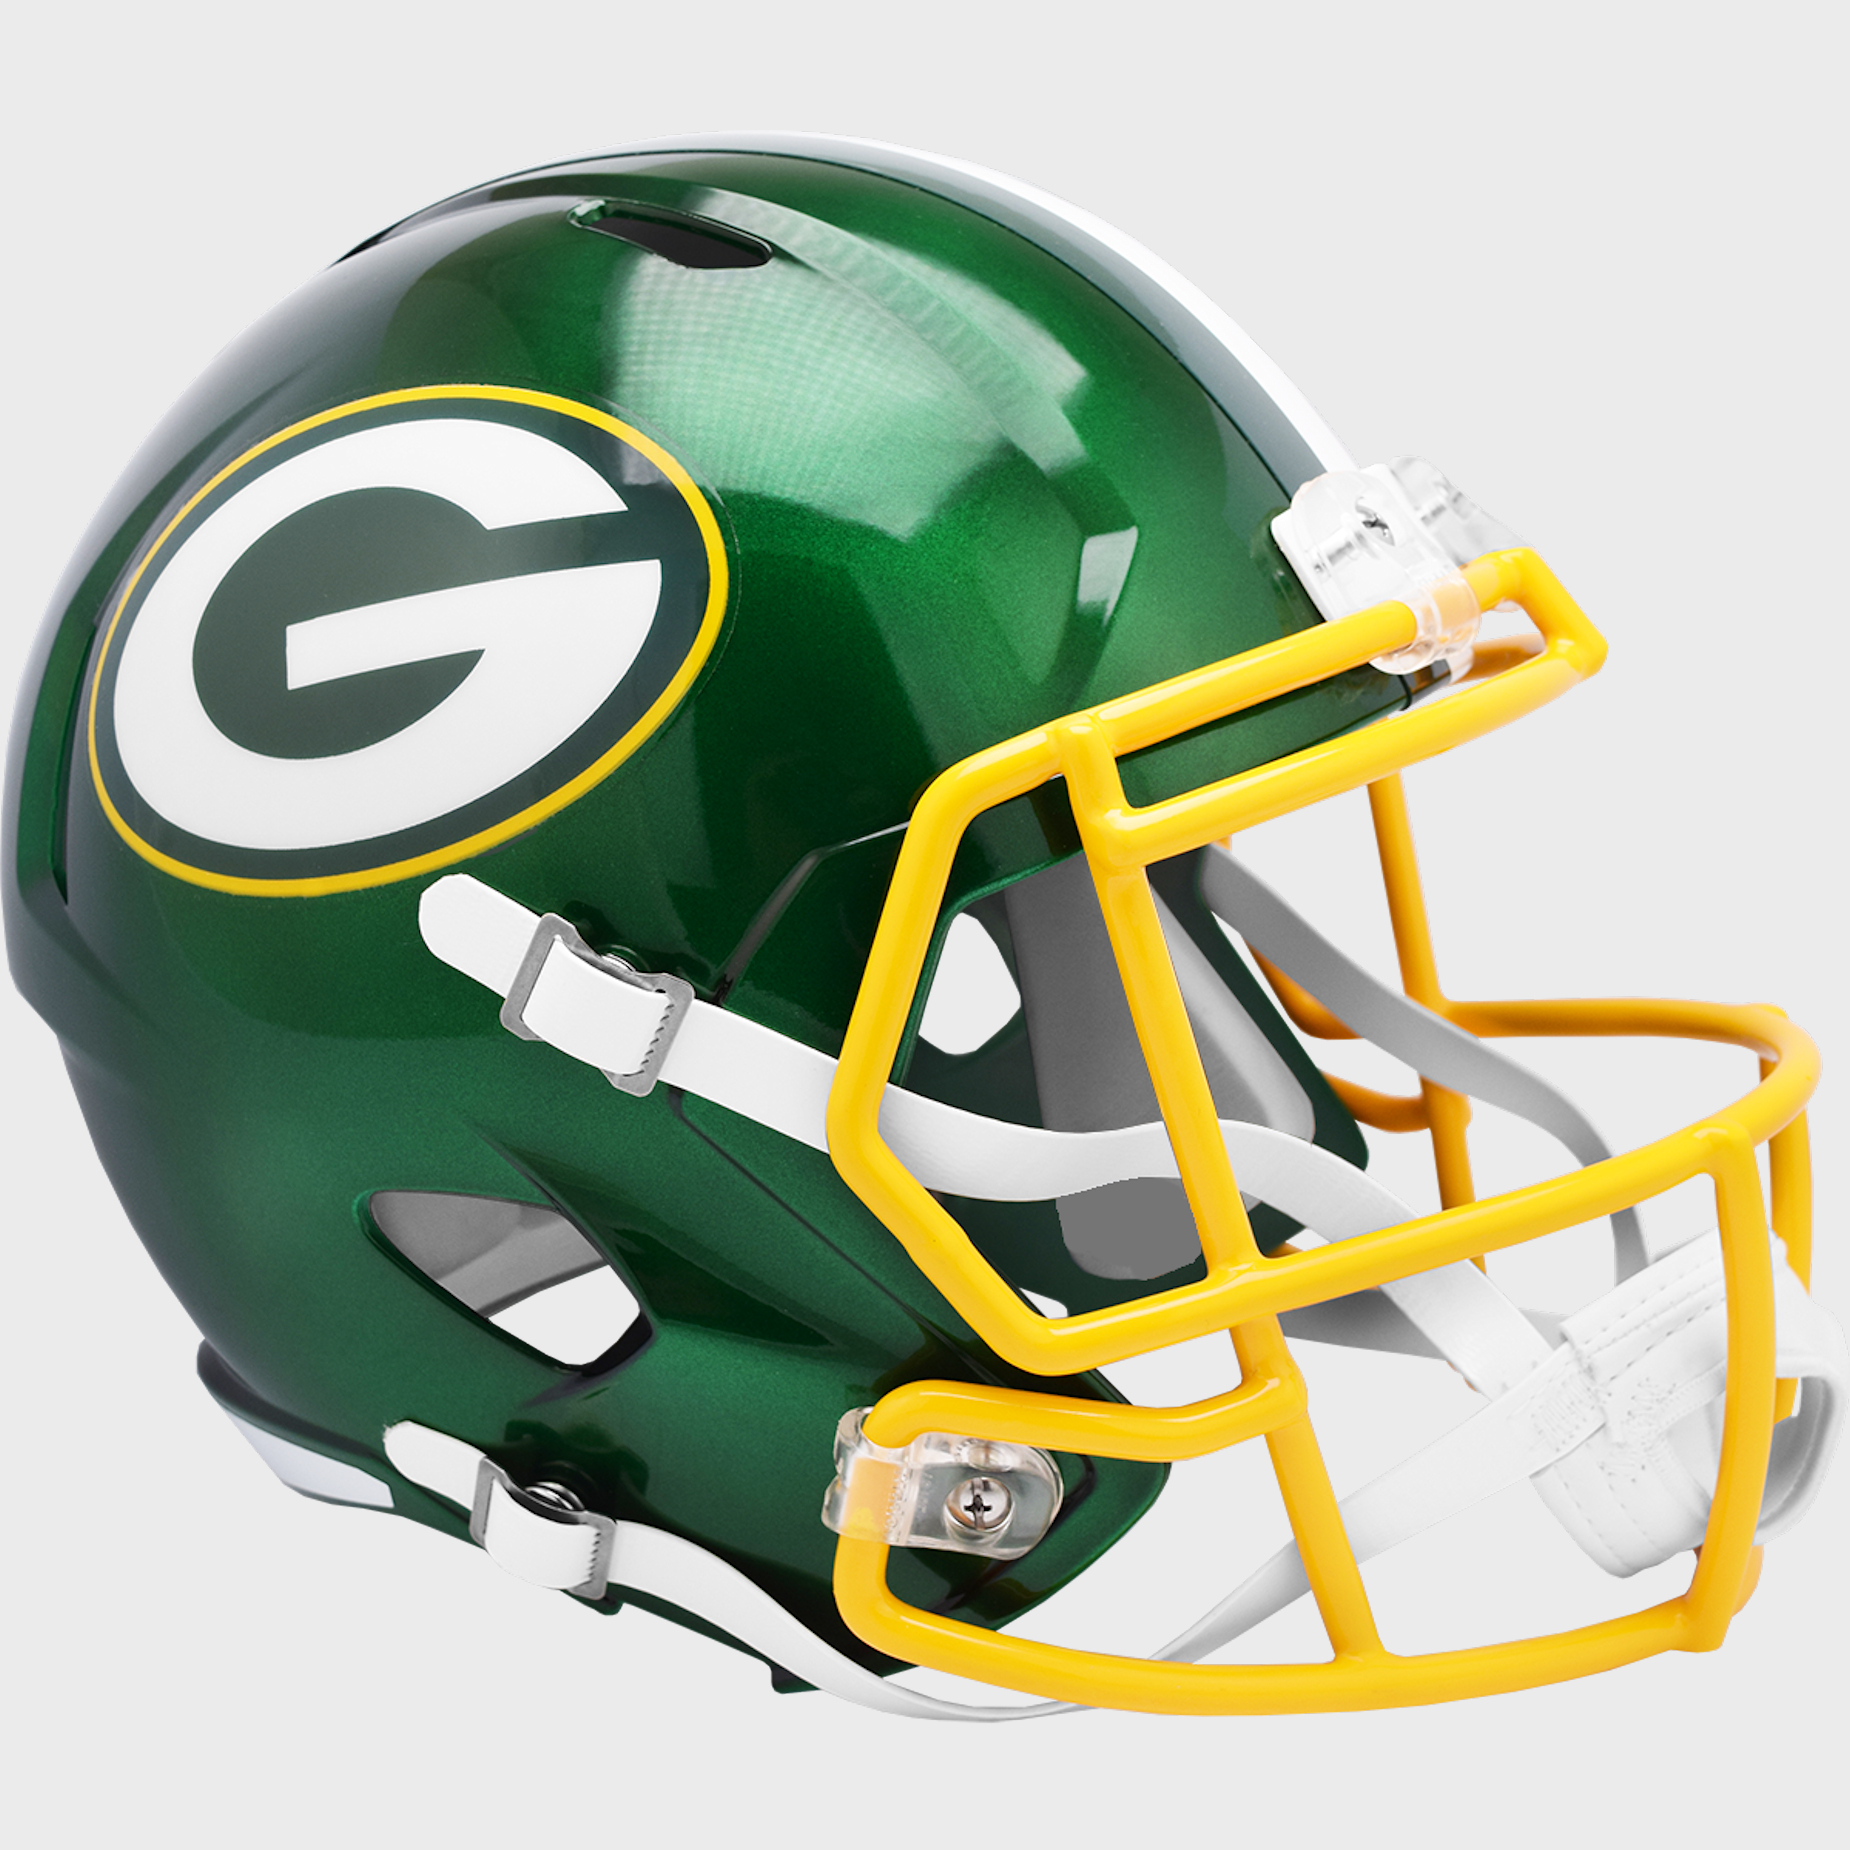 Green Bay Packers Speed Replica Football Helmet <B>FLASH ESD 8/21/21</B>